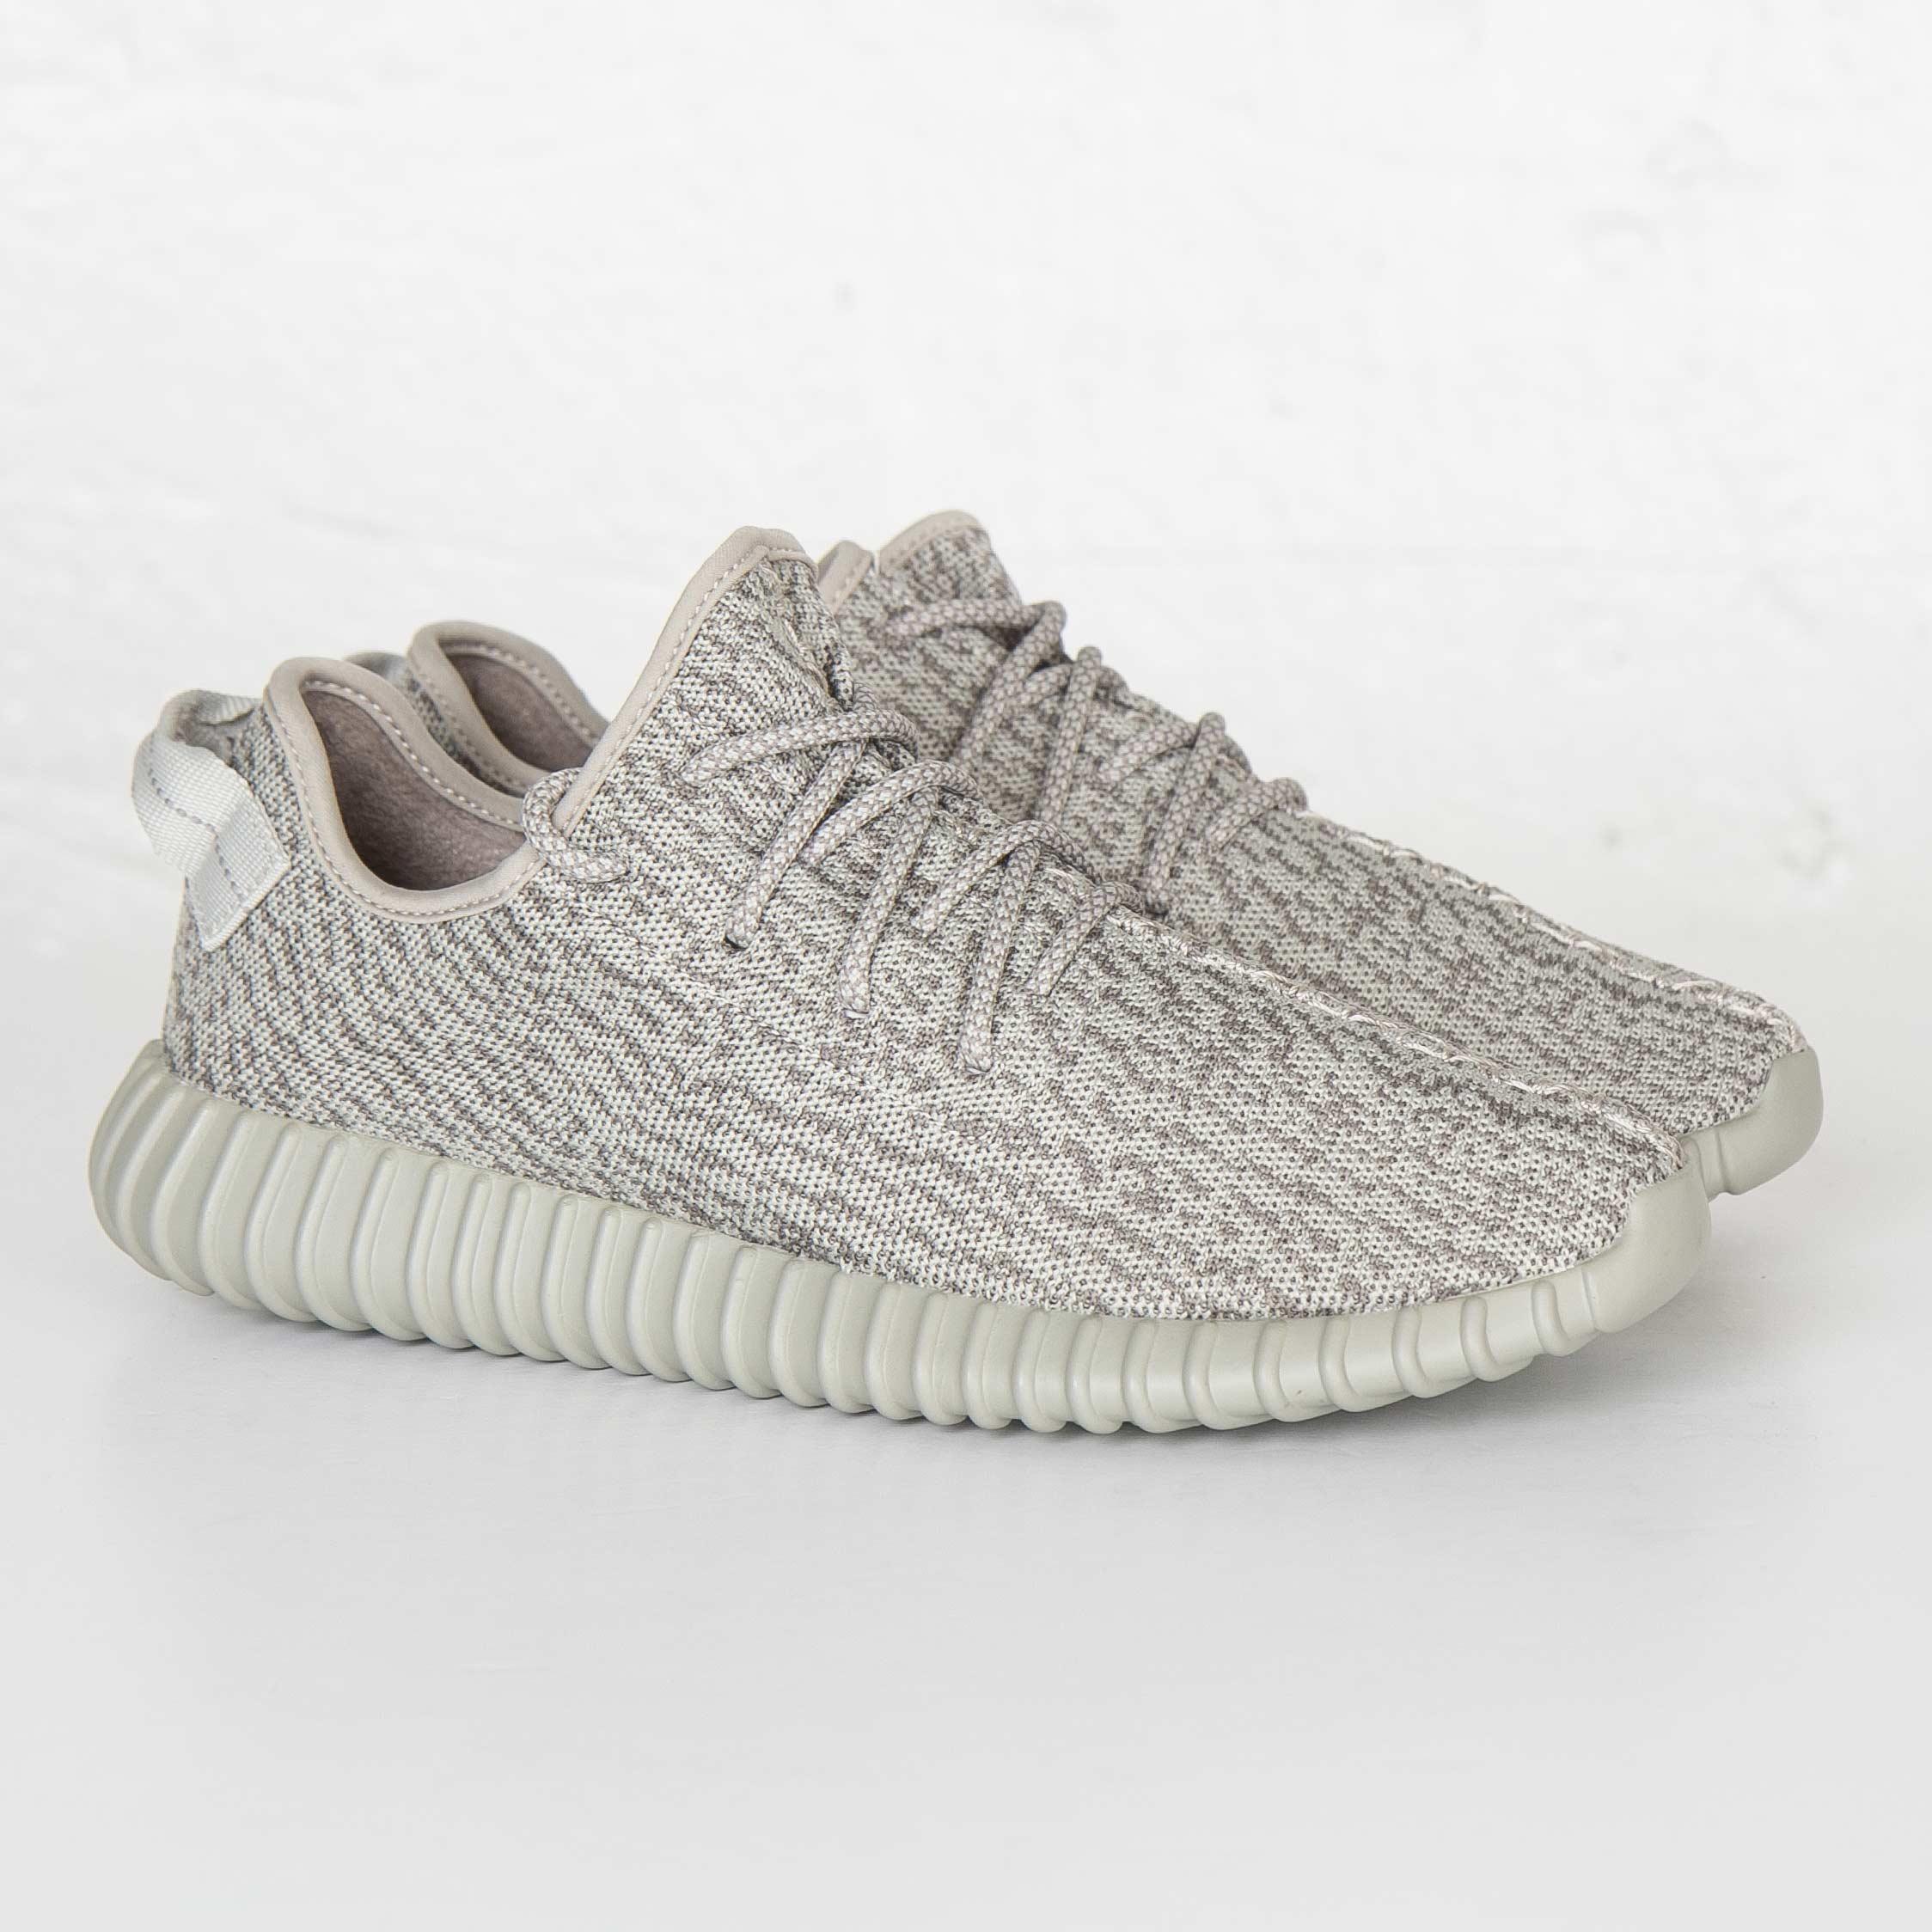 ecf66adfe adidas Yeezy Boost 350 - Aq2660 - Sneakersnstuff